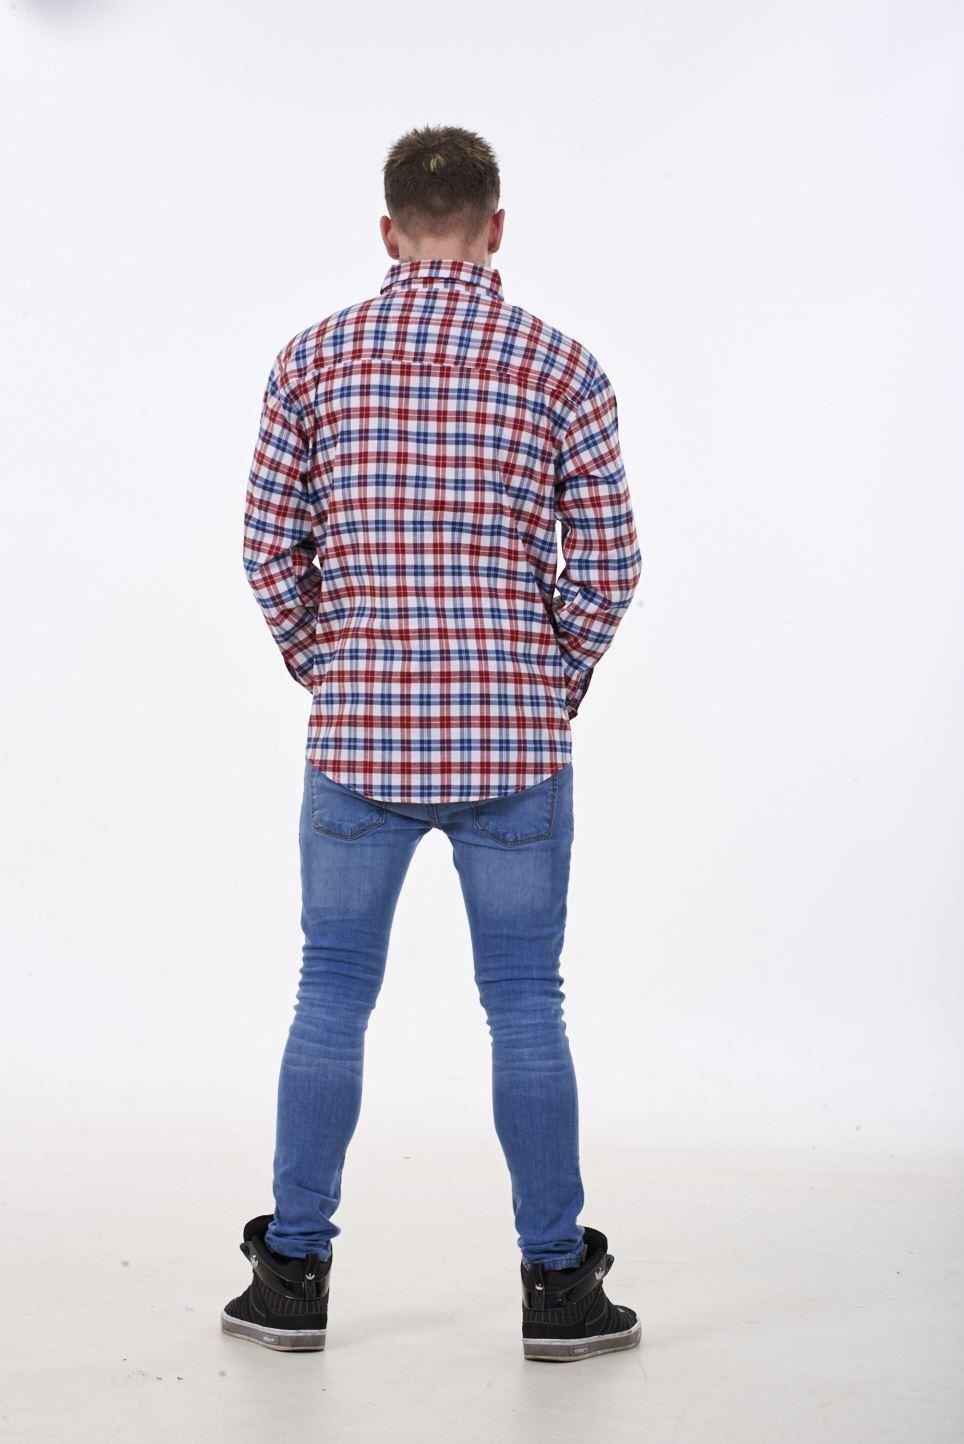 121798cbbcb Mens Checked Shirt Malay Apparel Cotton Casual Wear Long Sleeve ...